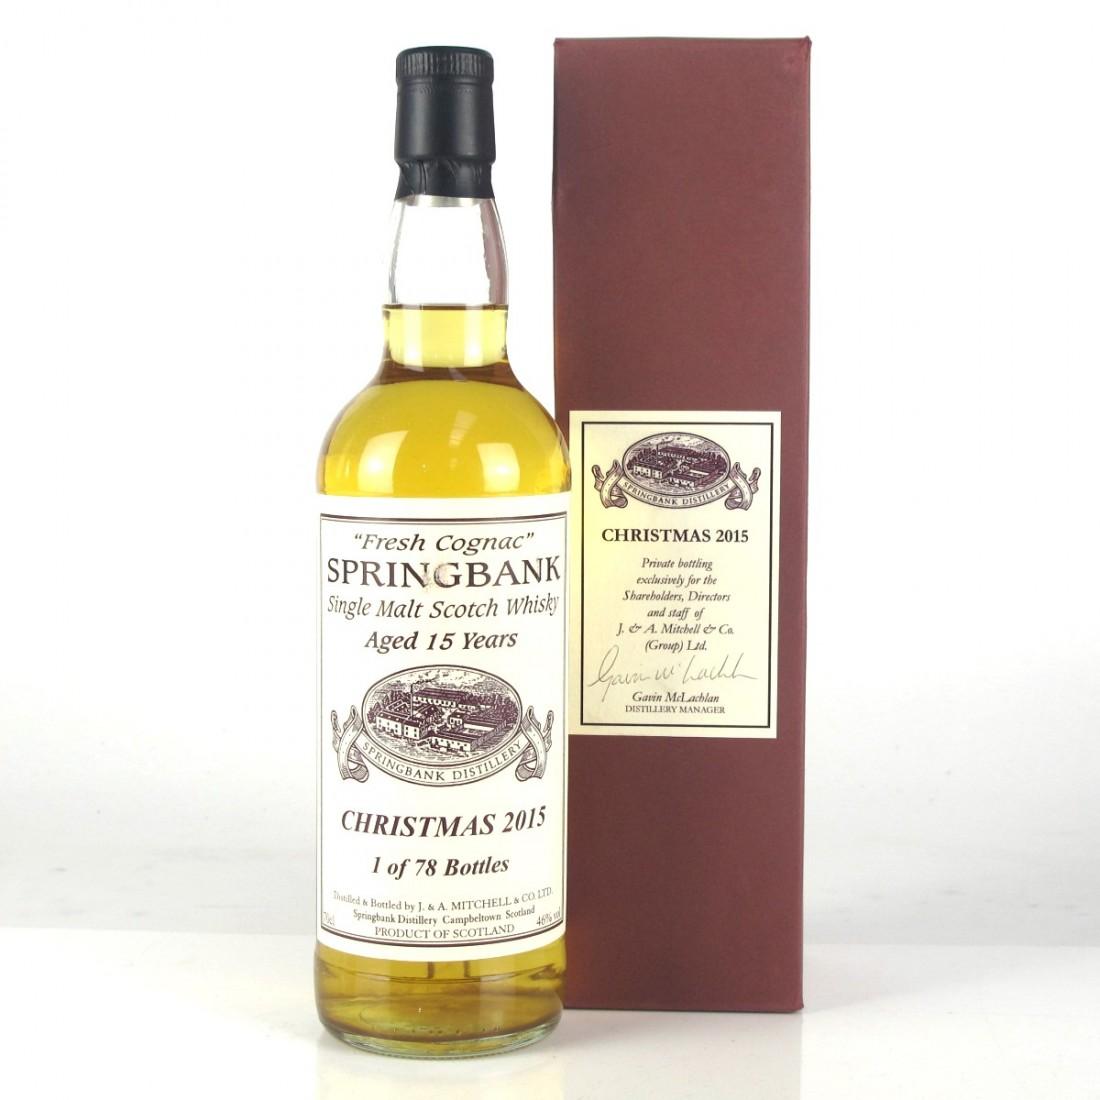 Springbank 15 Year Old Fresh Cognac / Christmas 2015